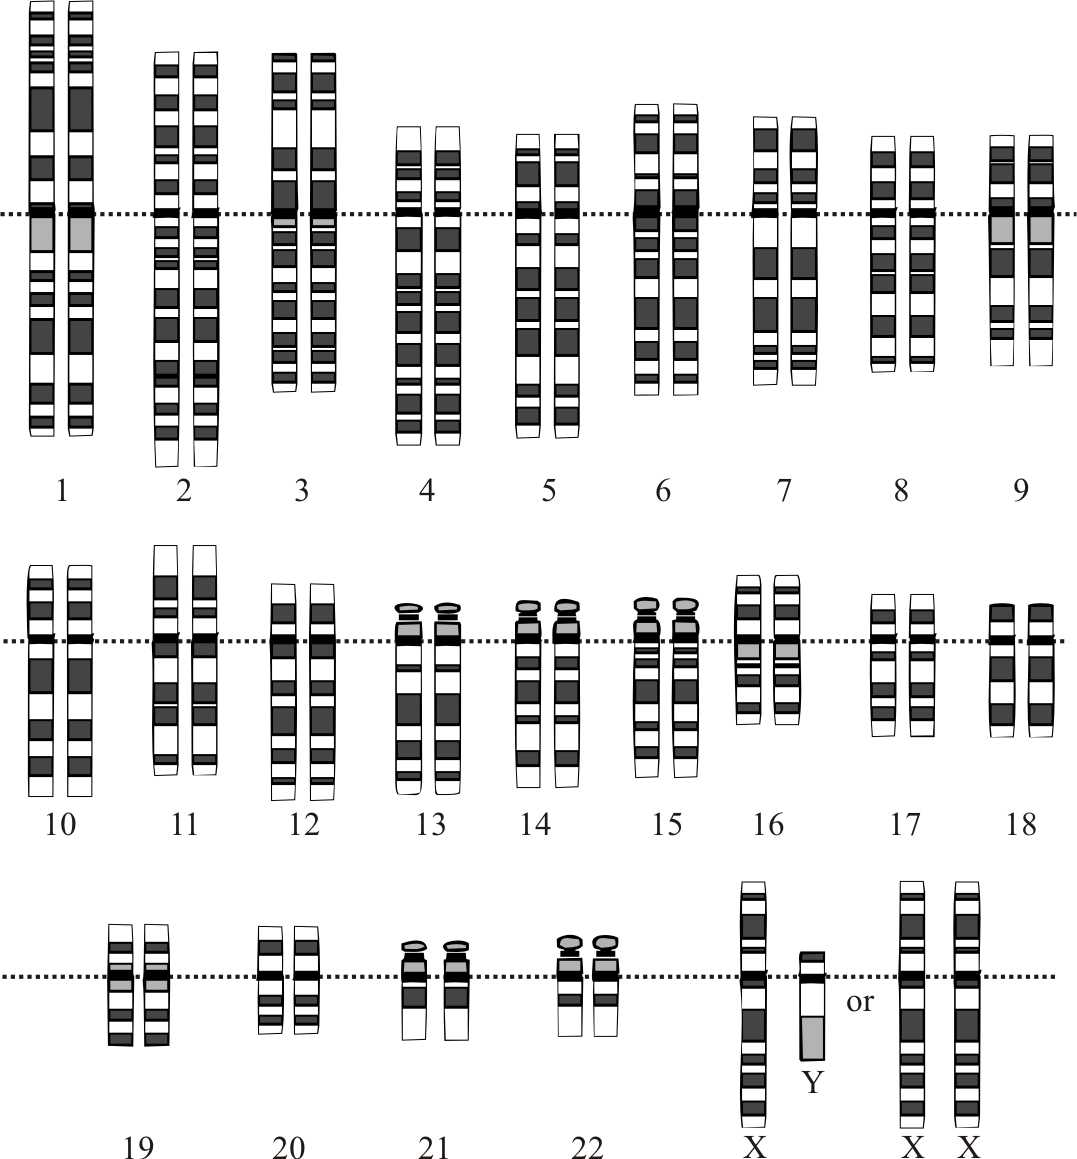 Mutations Worksheet Answer Key And Human Genetic Variation